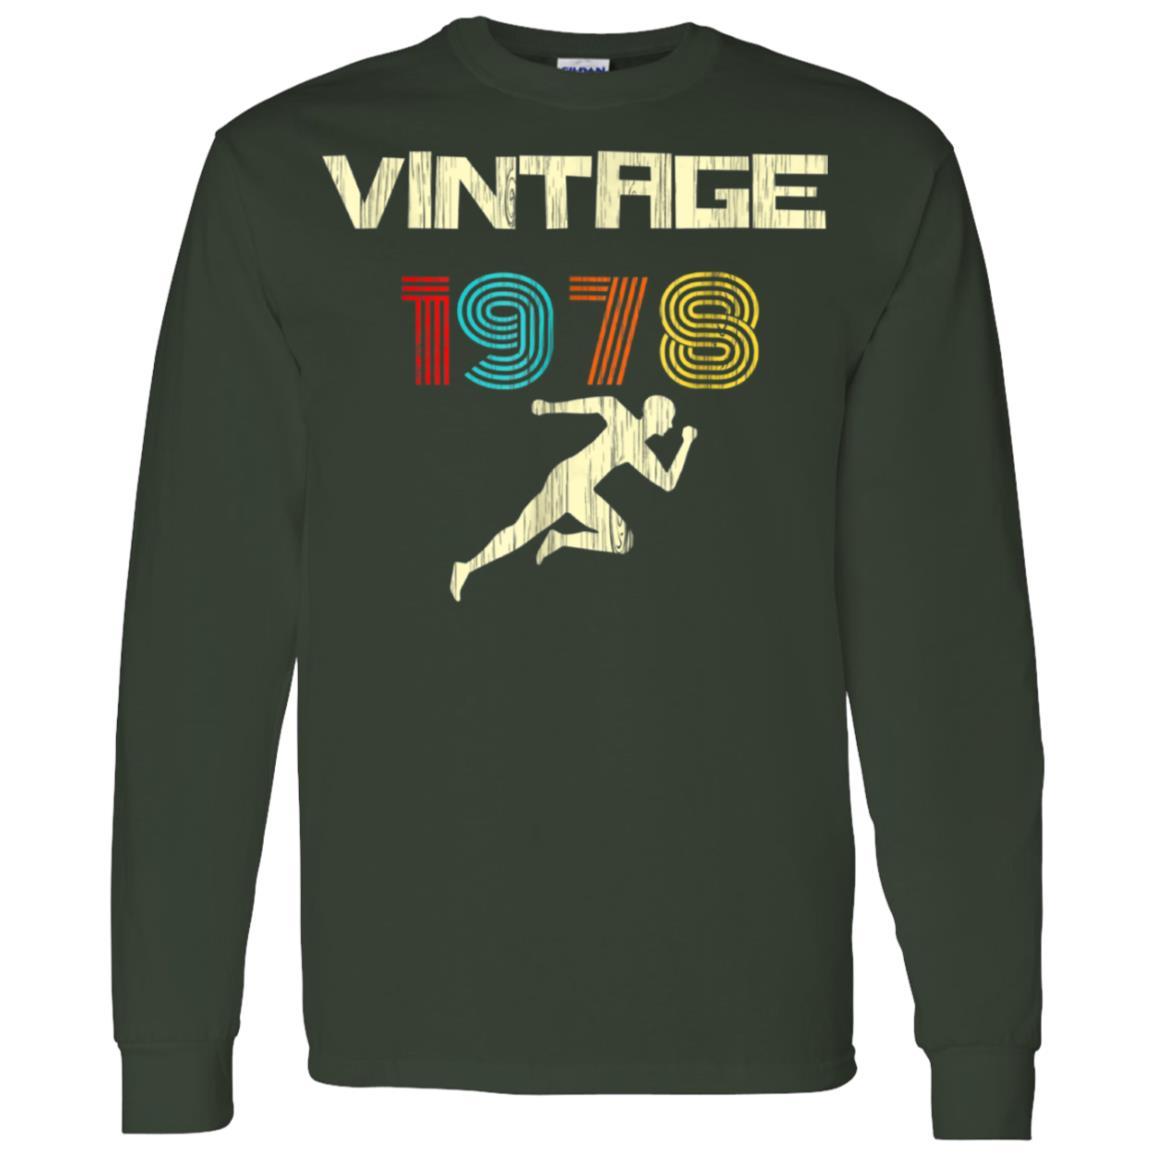 Runner's Vintage 1978 40th Birthday Men Long Sleeve T-Shirt